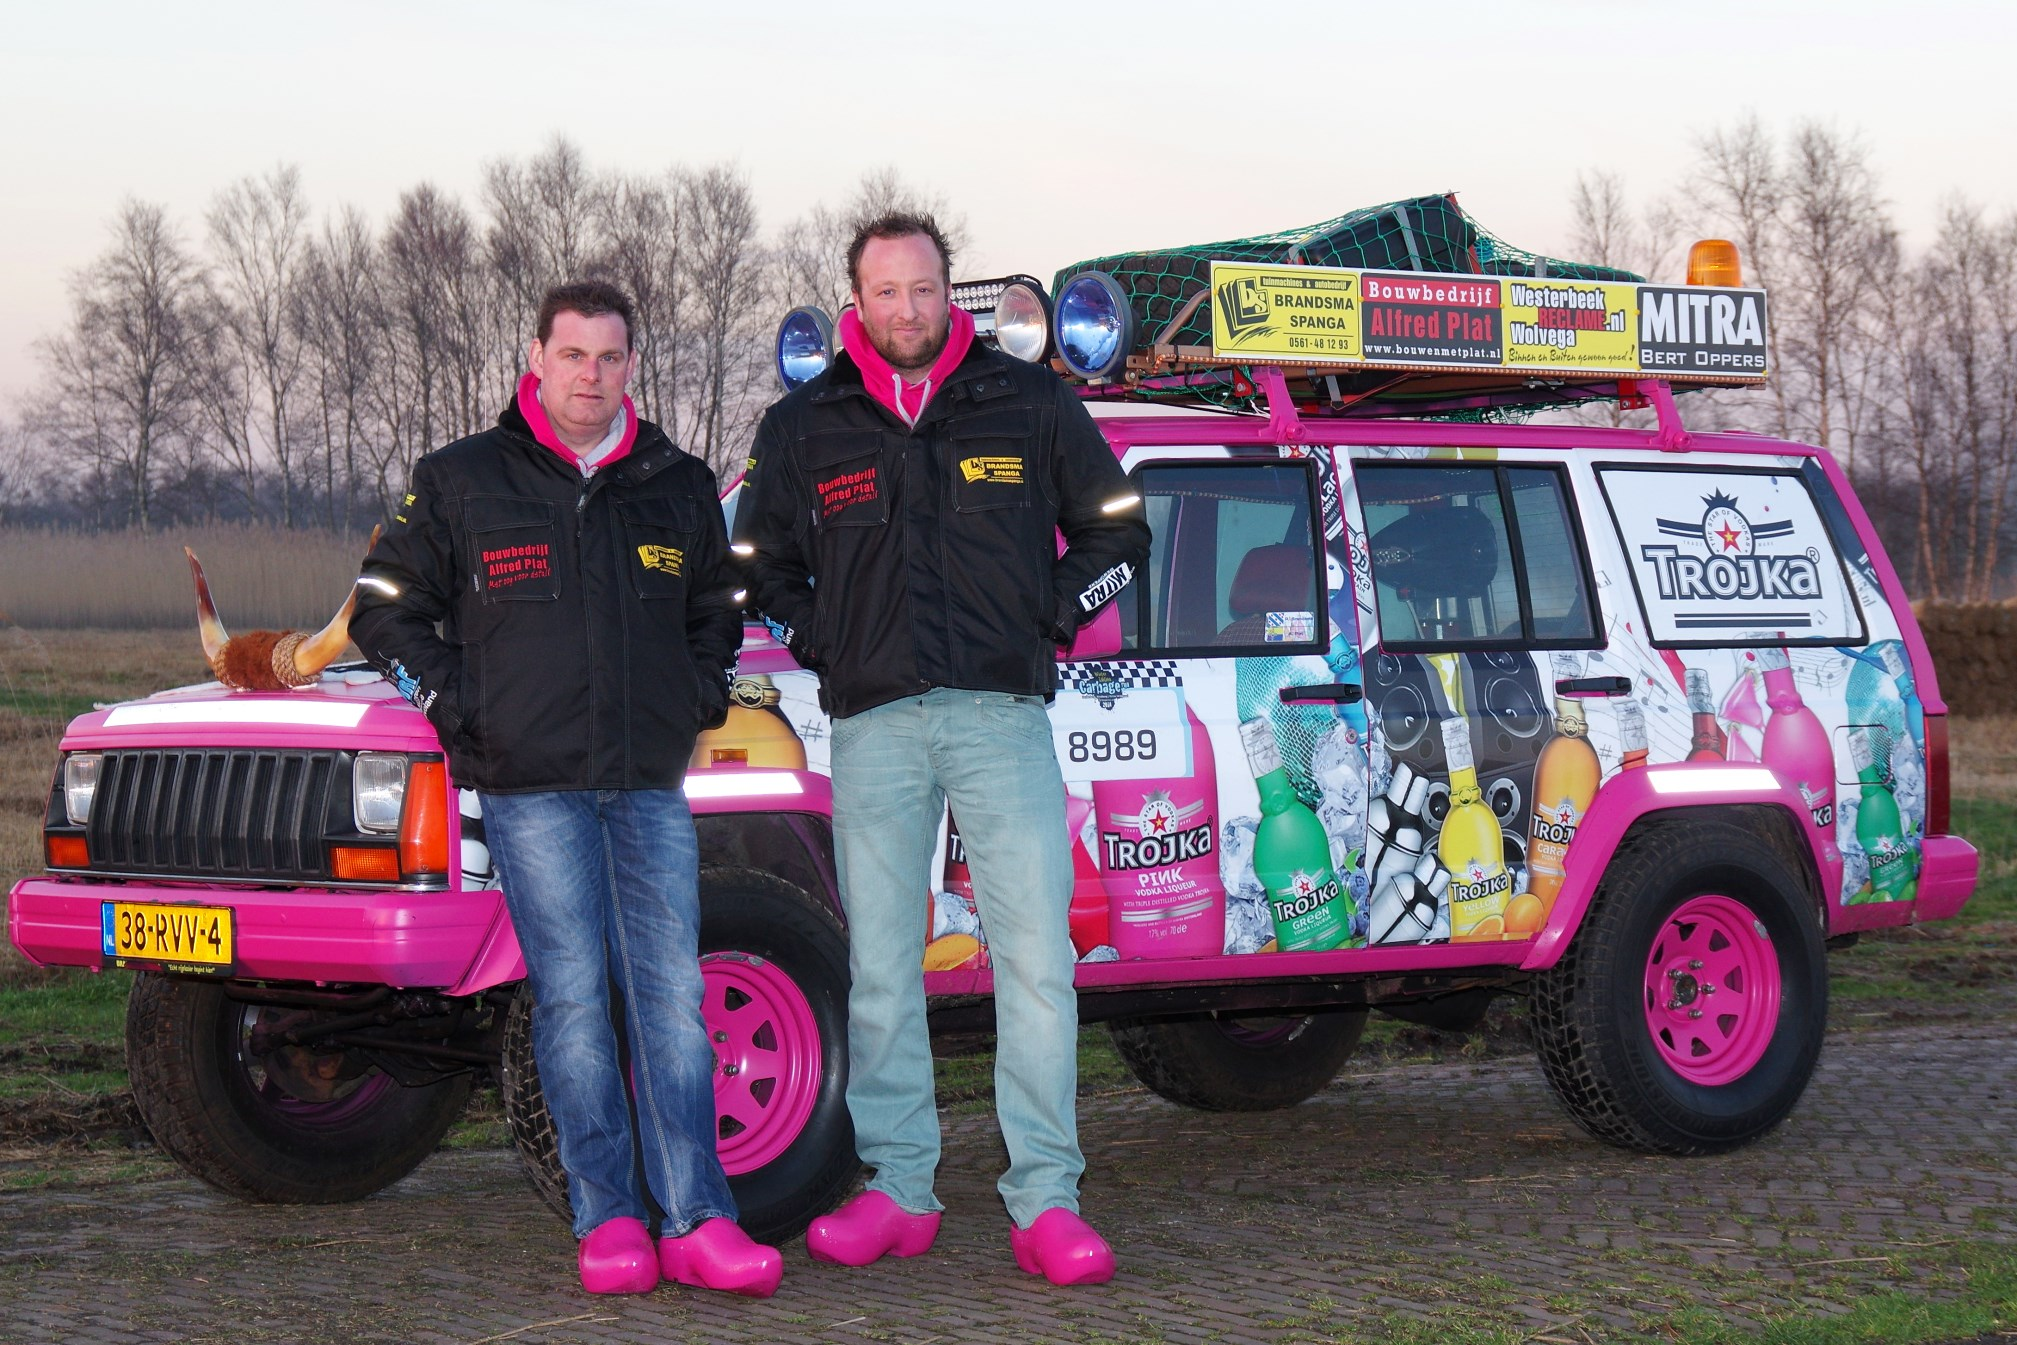 Trojka Pink barrel team door Europa Peter Brandsma